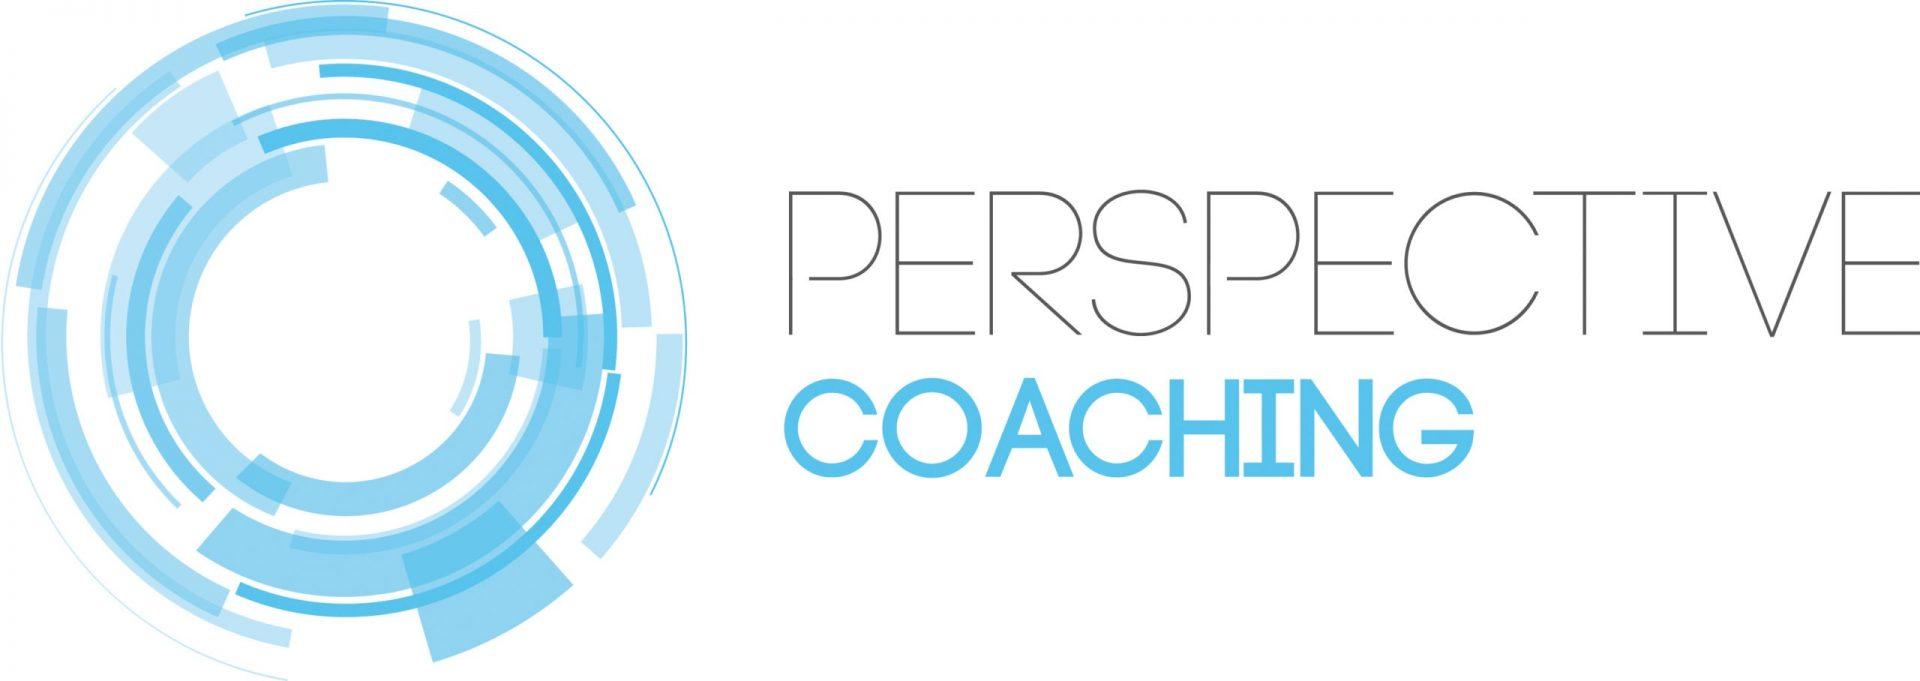 Logo Coaching horizontal